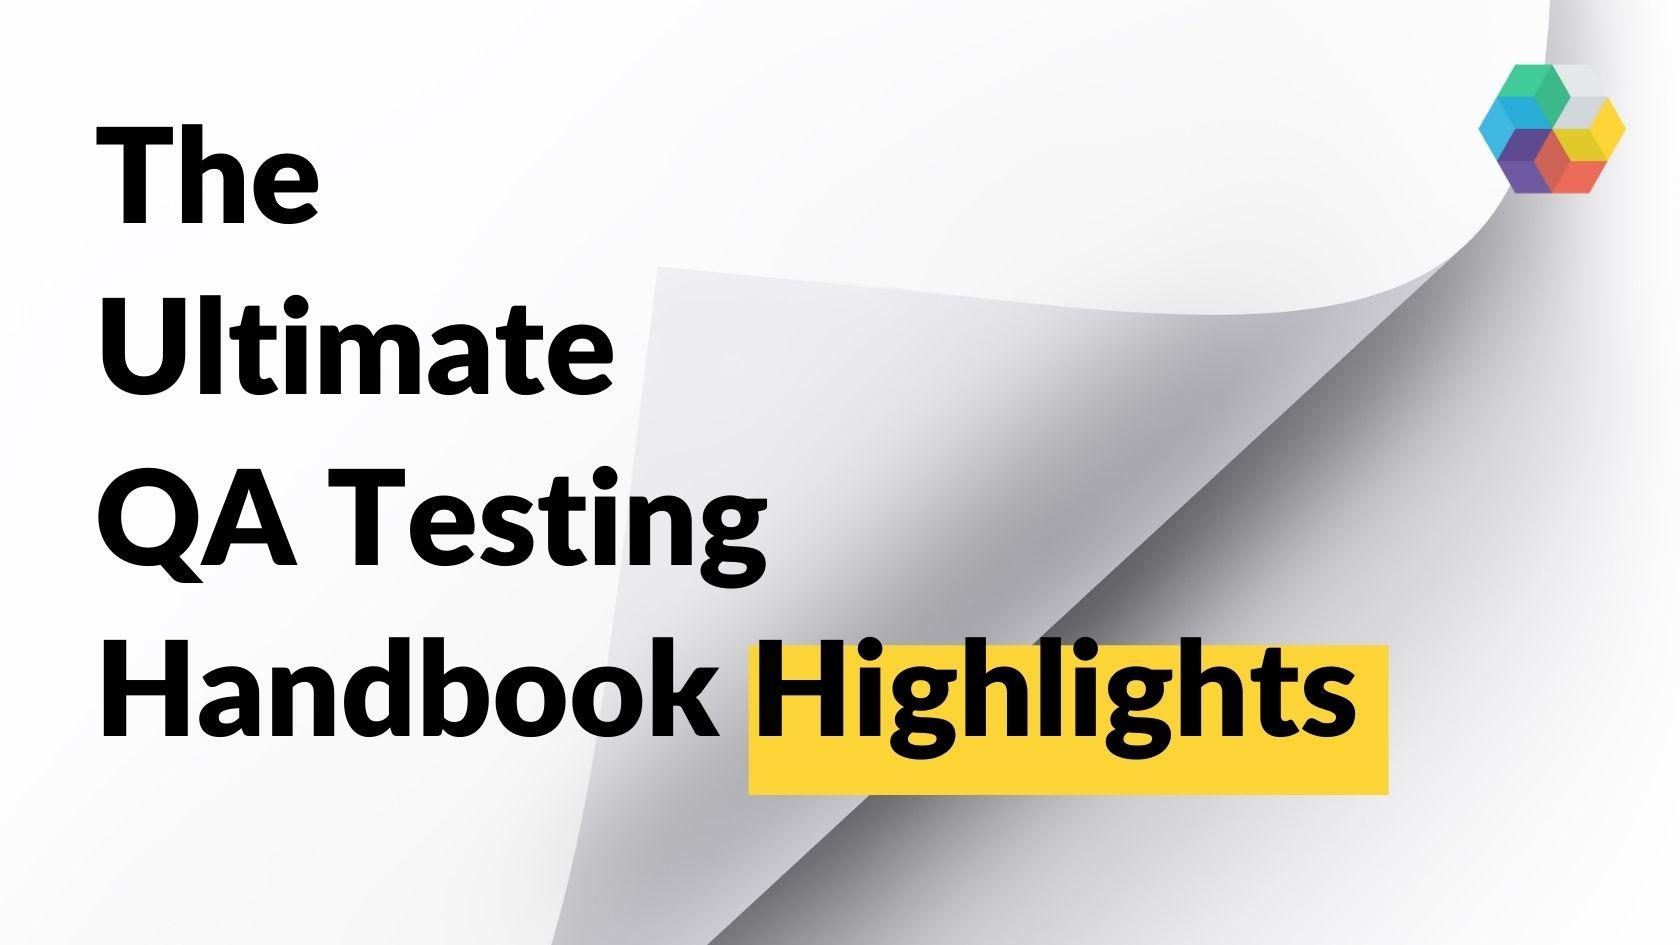 The Ultimate QA Testing Handbook Highlights